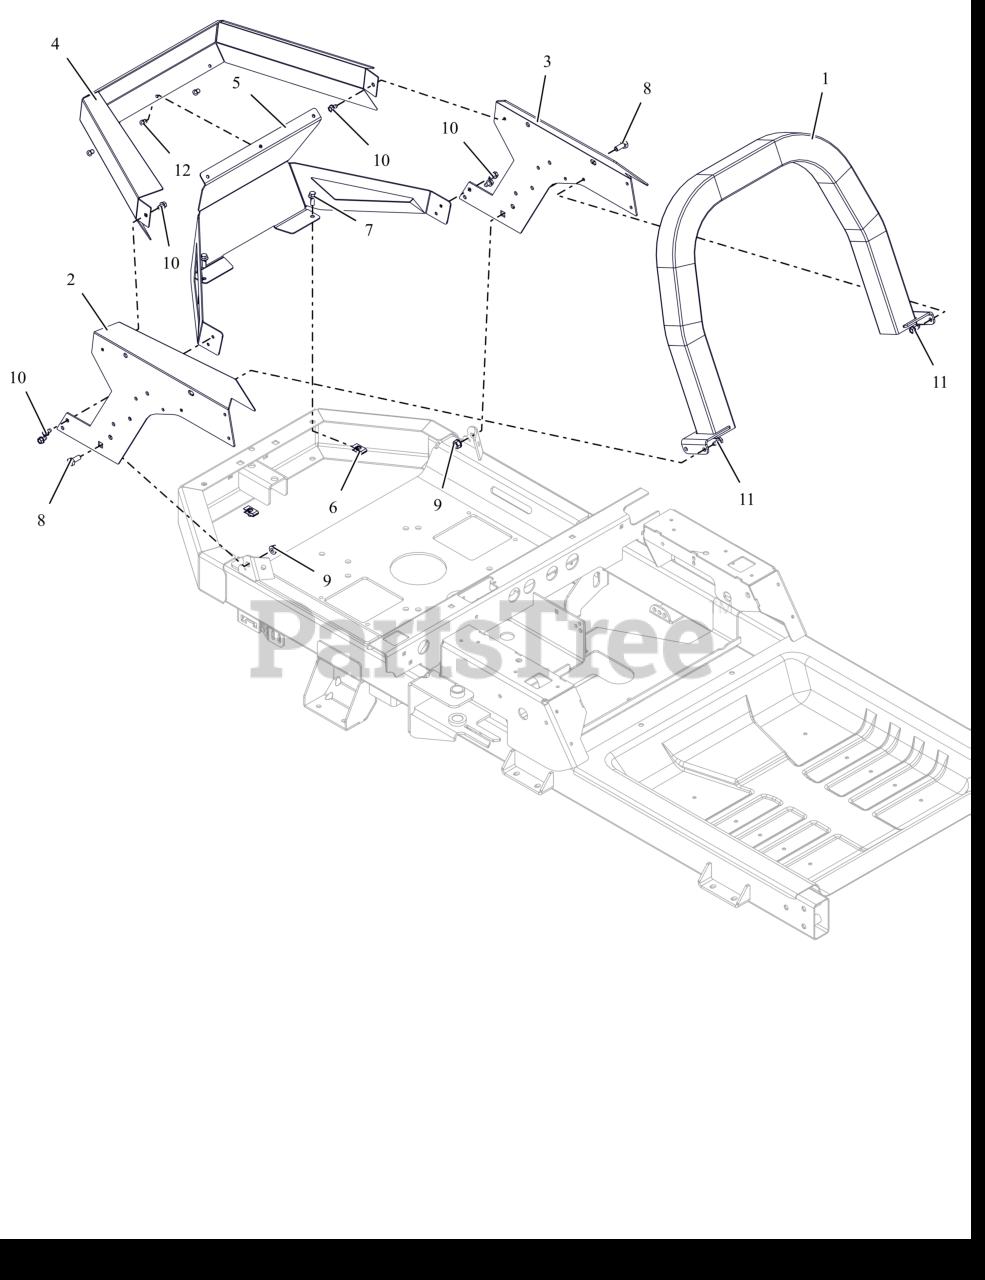 Ariens 915273 Ariens Ikon Xd 60 Zero Turn Mower 23hp Kawasaki Fr Sn 000101 Above Engine Guard Parts Lookup With Diagrams Partstree